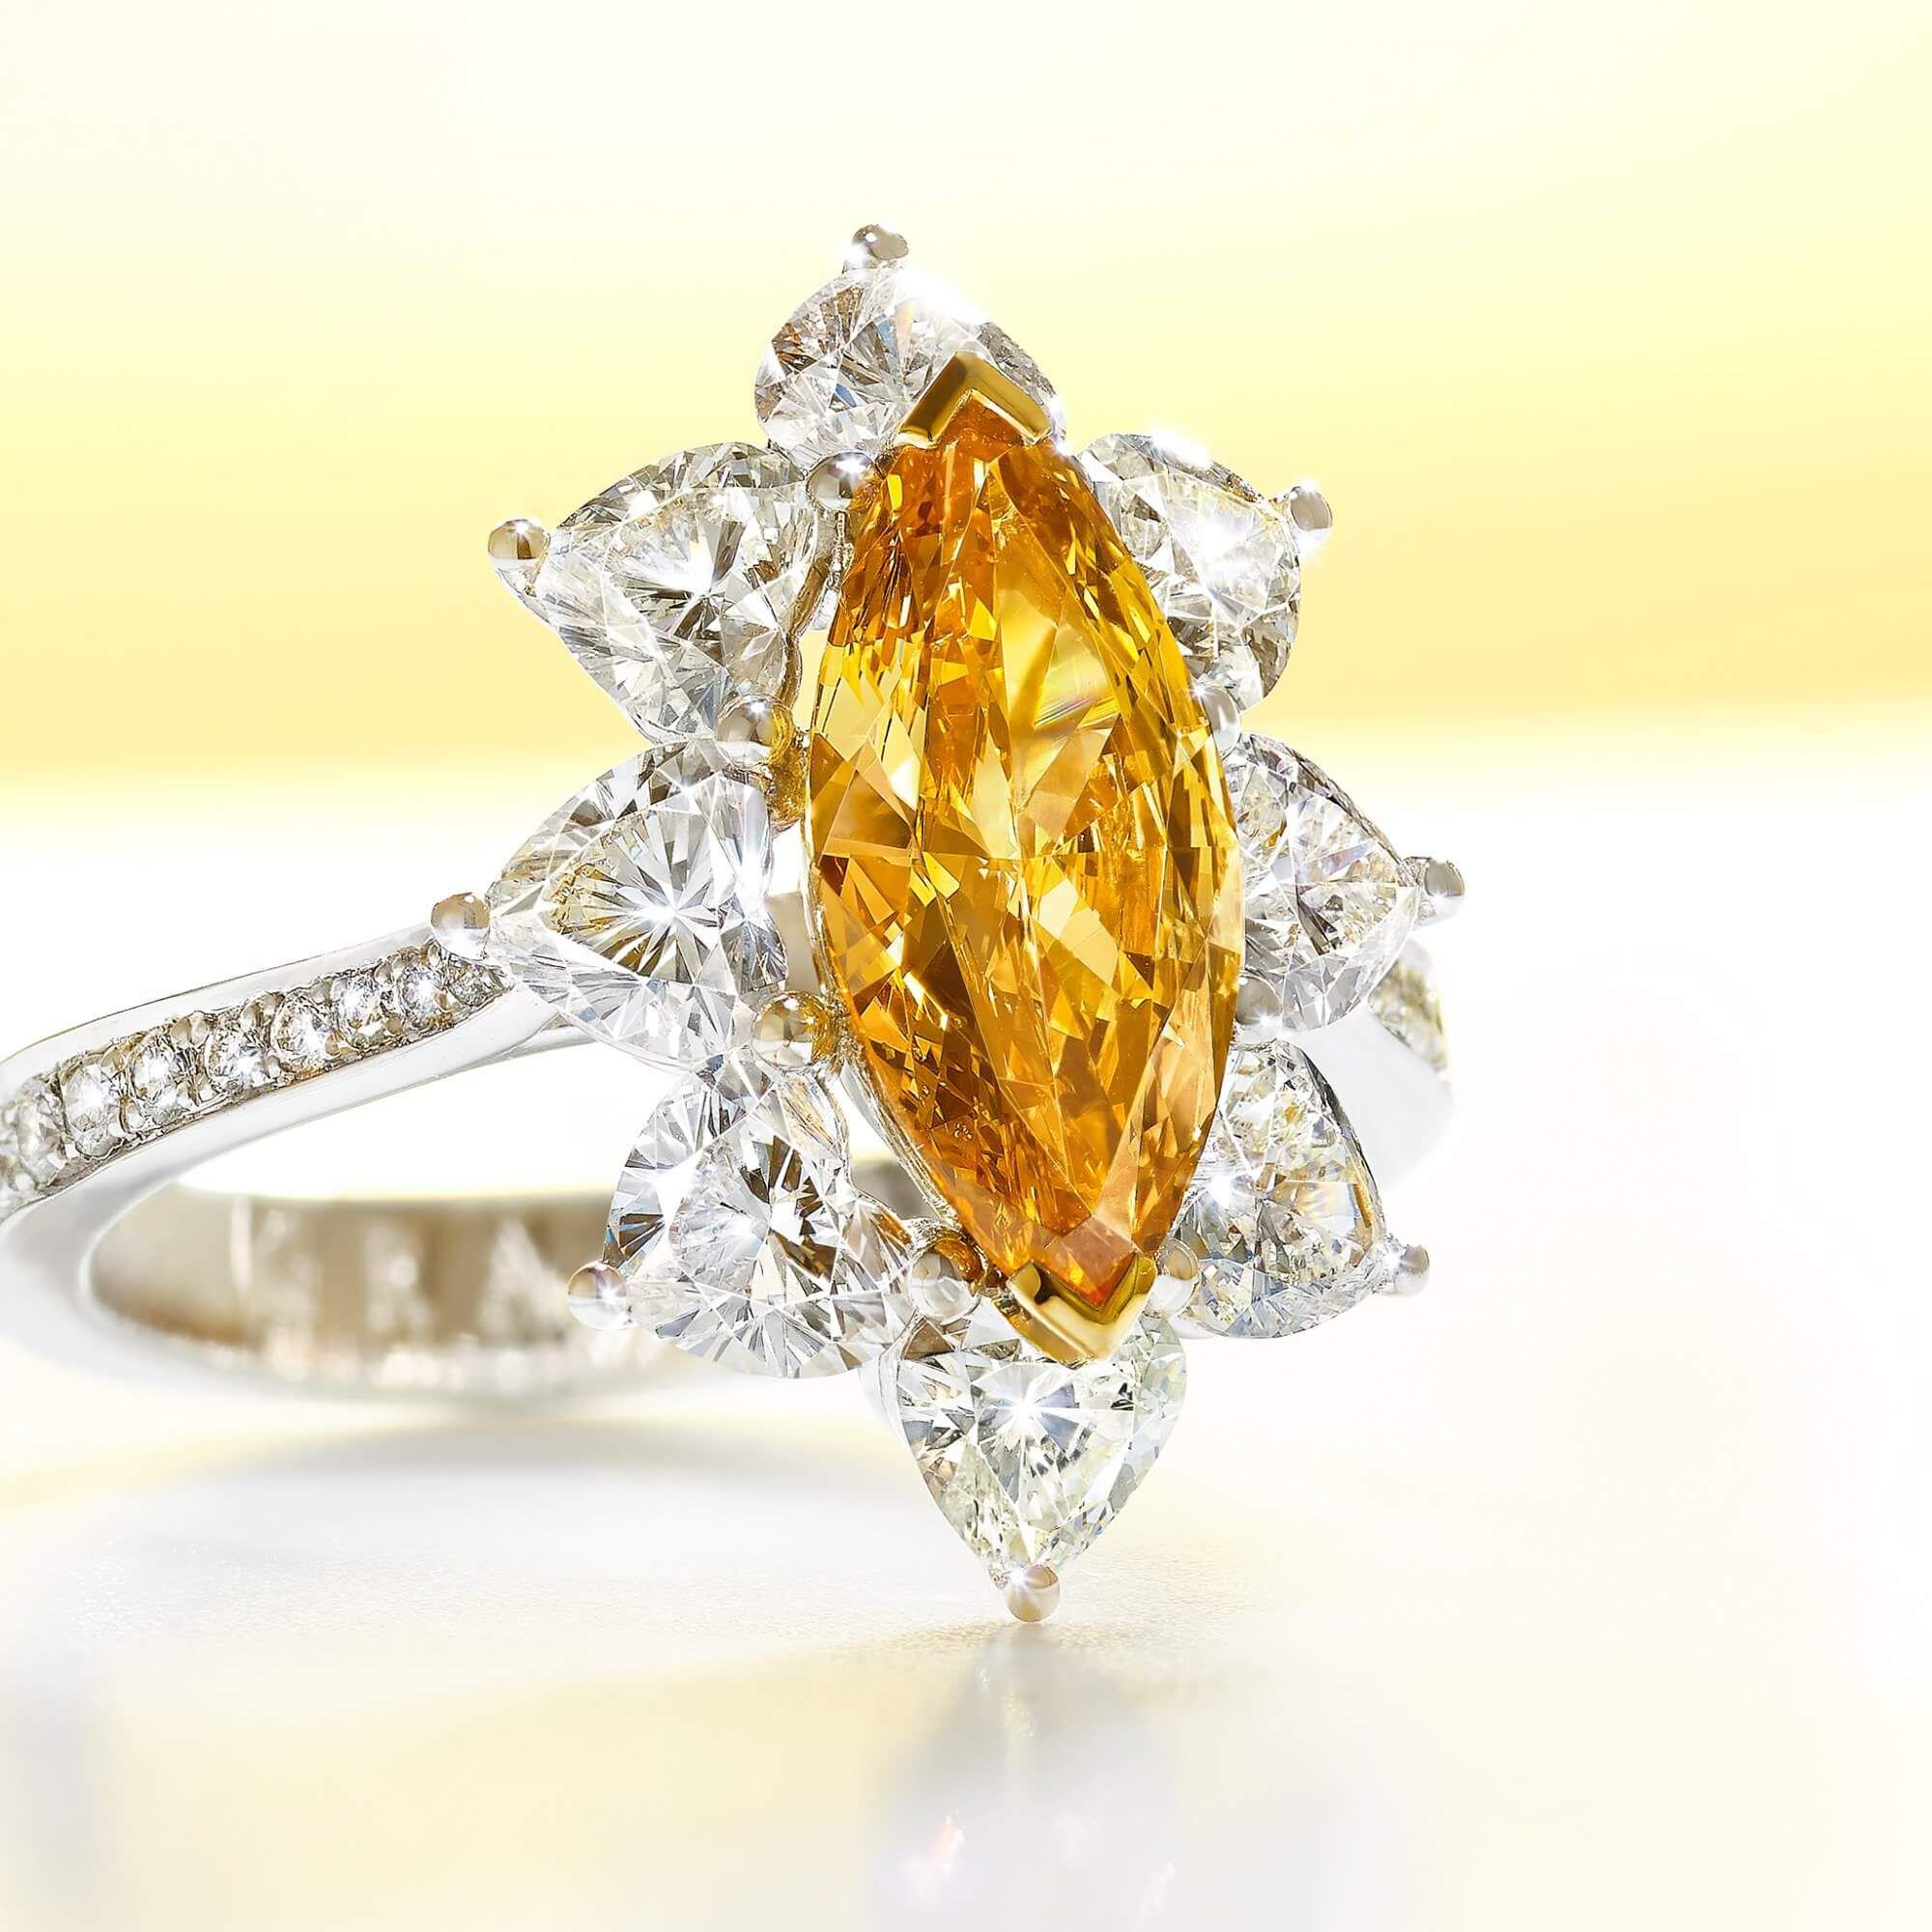 A 1 carat Fancy Vivid Yellow Orange marquise diamond Graff ring - GR50908